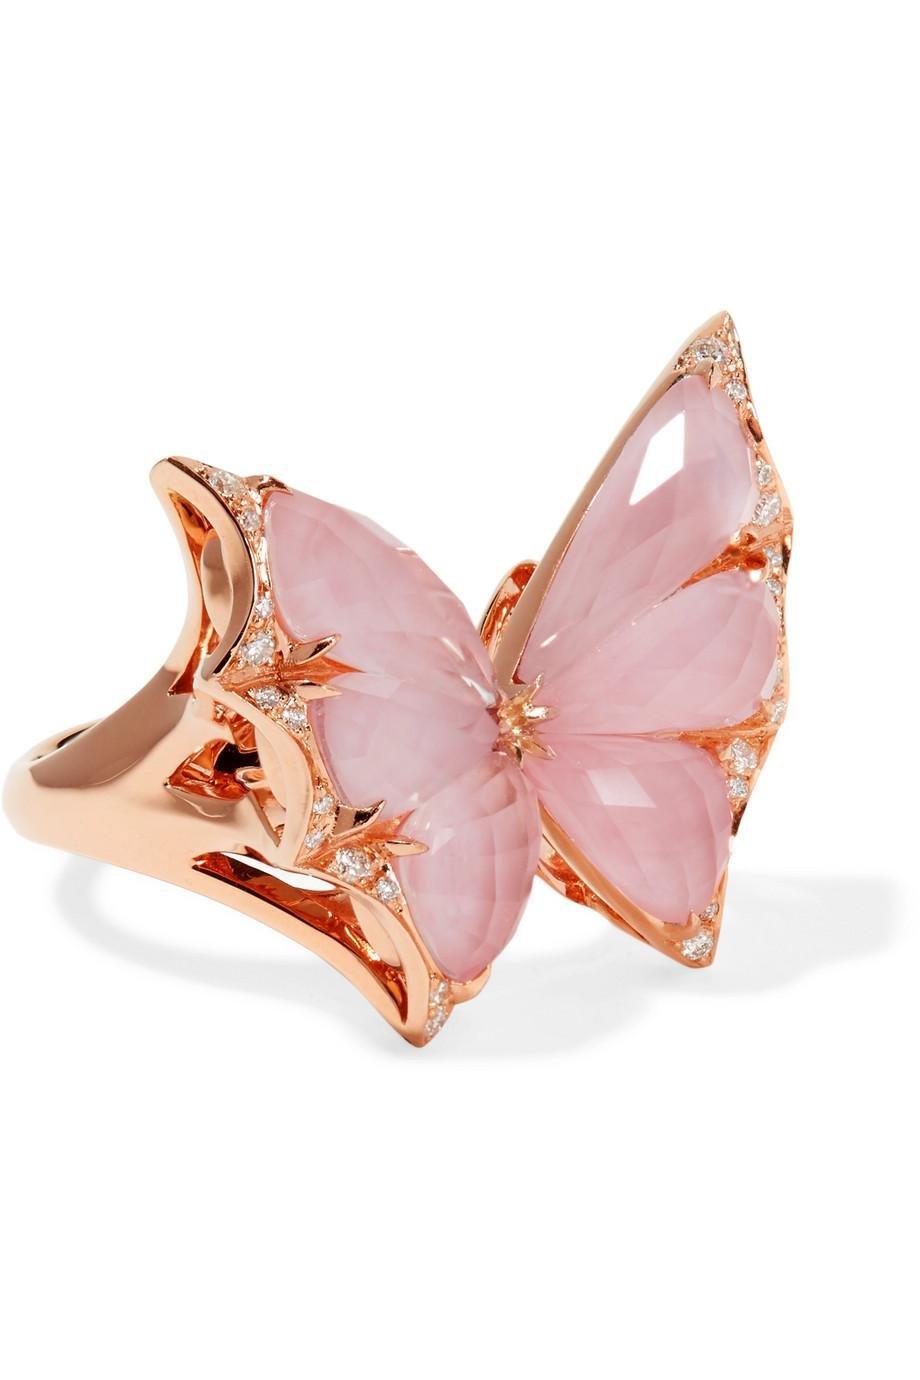 Stephen Webster Fly By Night 18-karat Rose Gold Multi-stone Ring STp7p